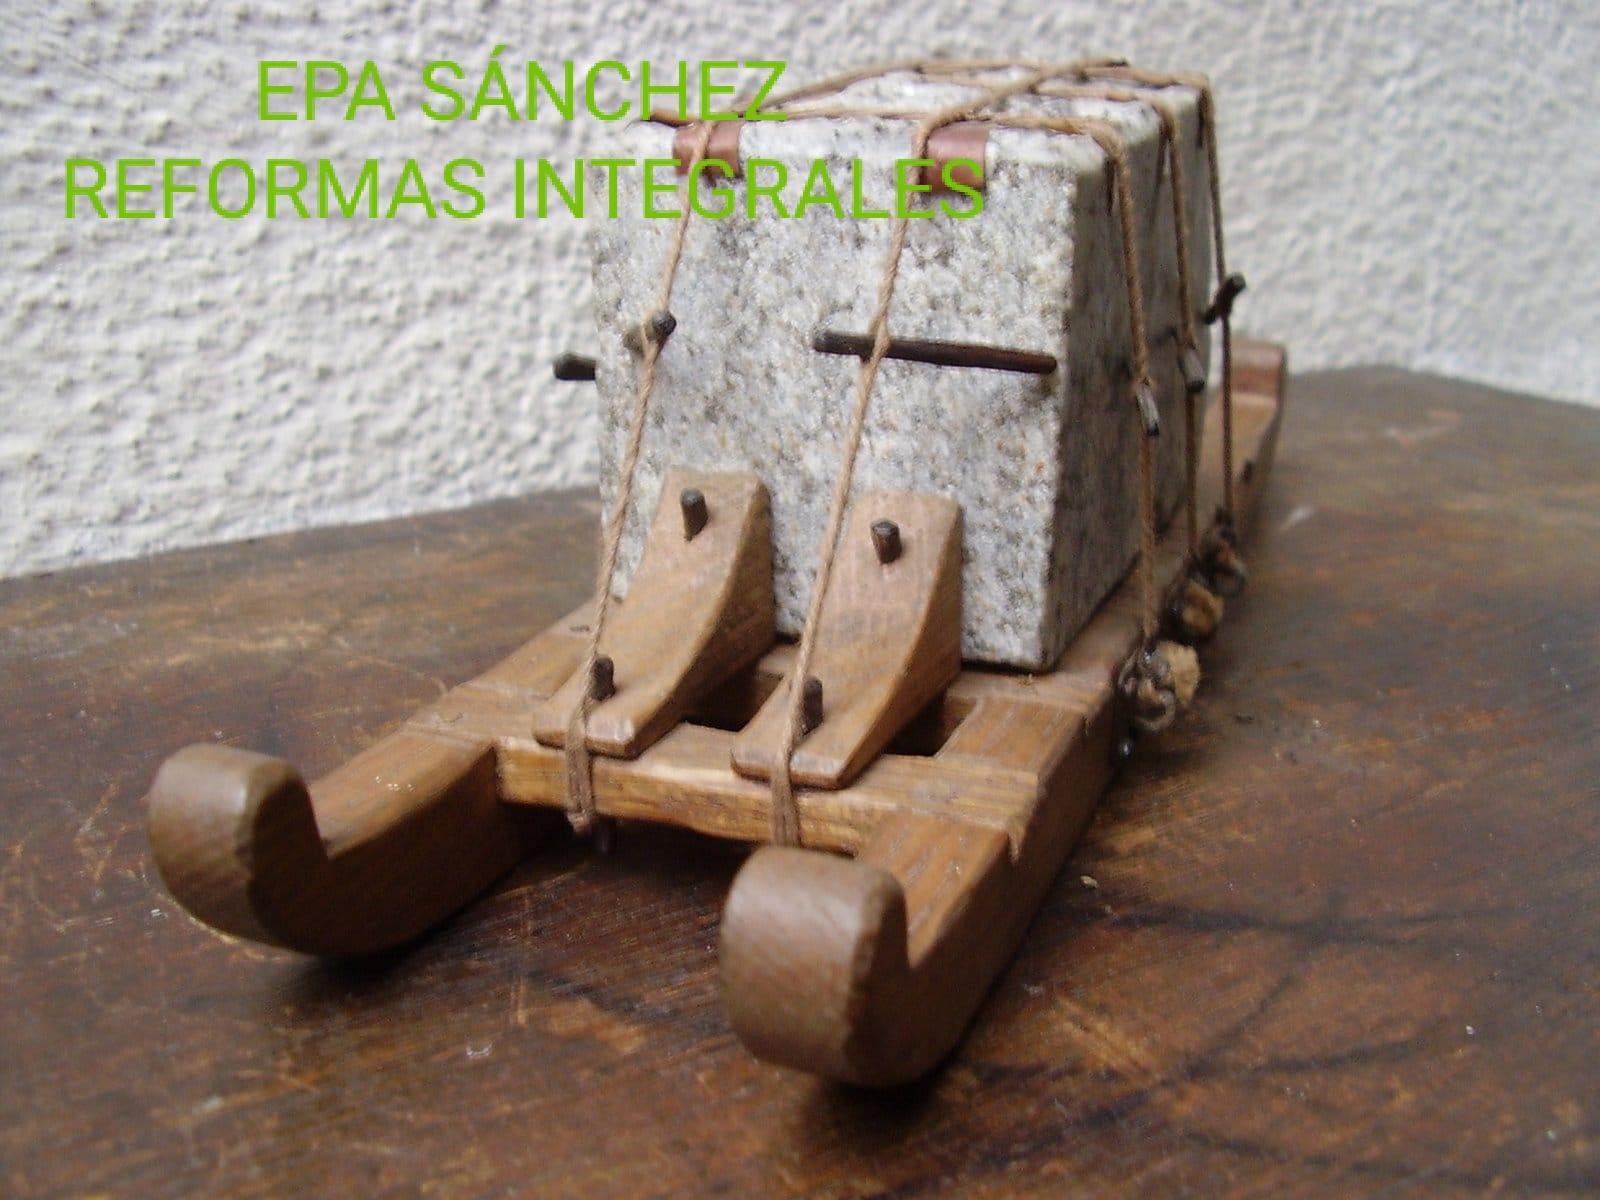 EPA SANCHEZ REFORMAS INTEGRALES